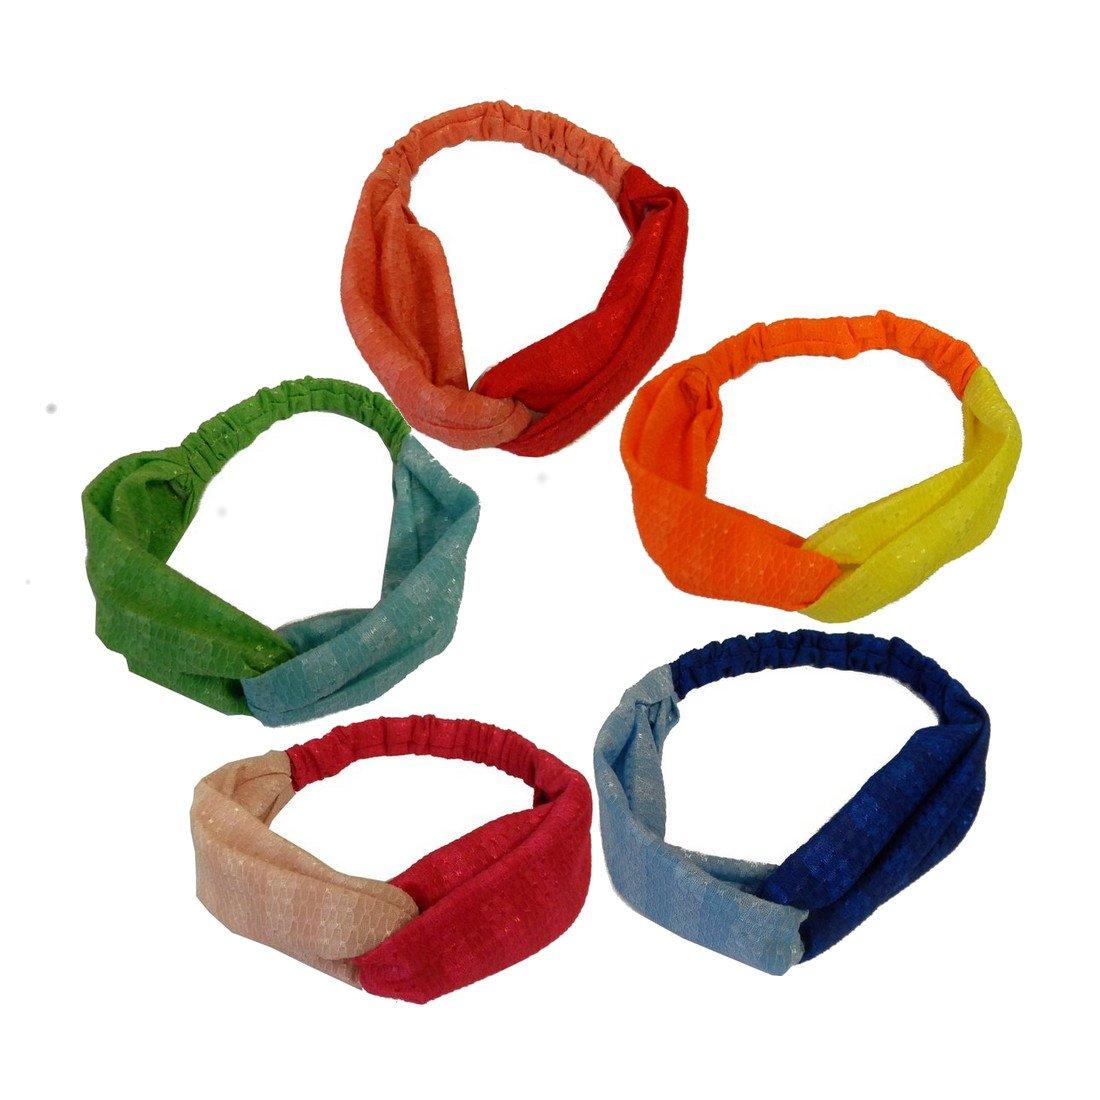 5 Two Tone Textured Turband Headband Boho Head Wraps